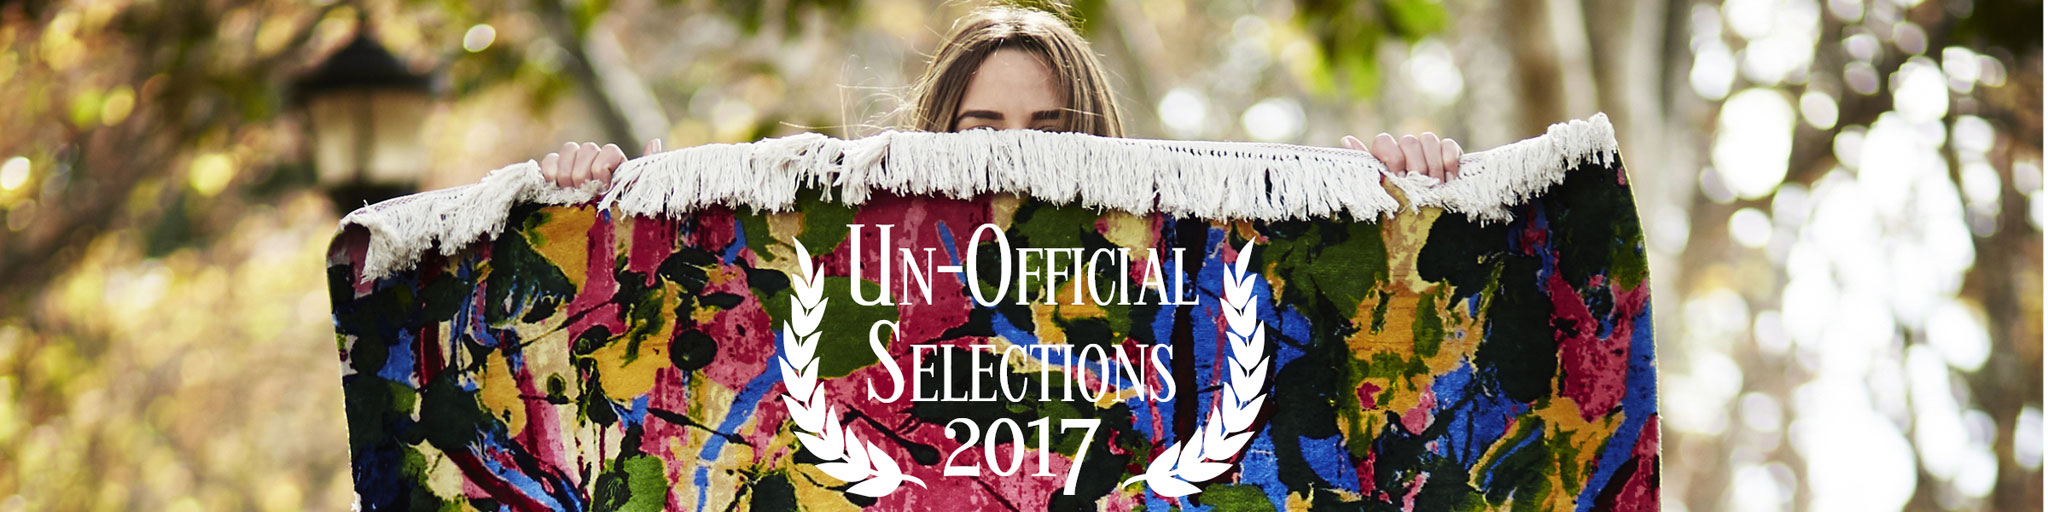 Un-Official Selections 2017